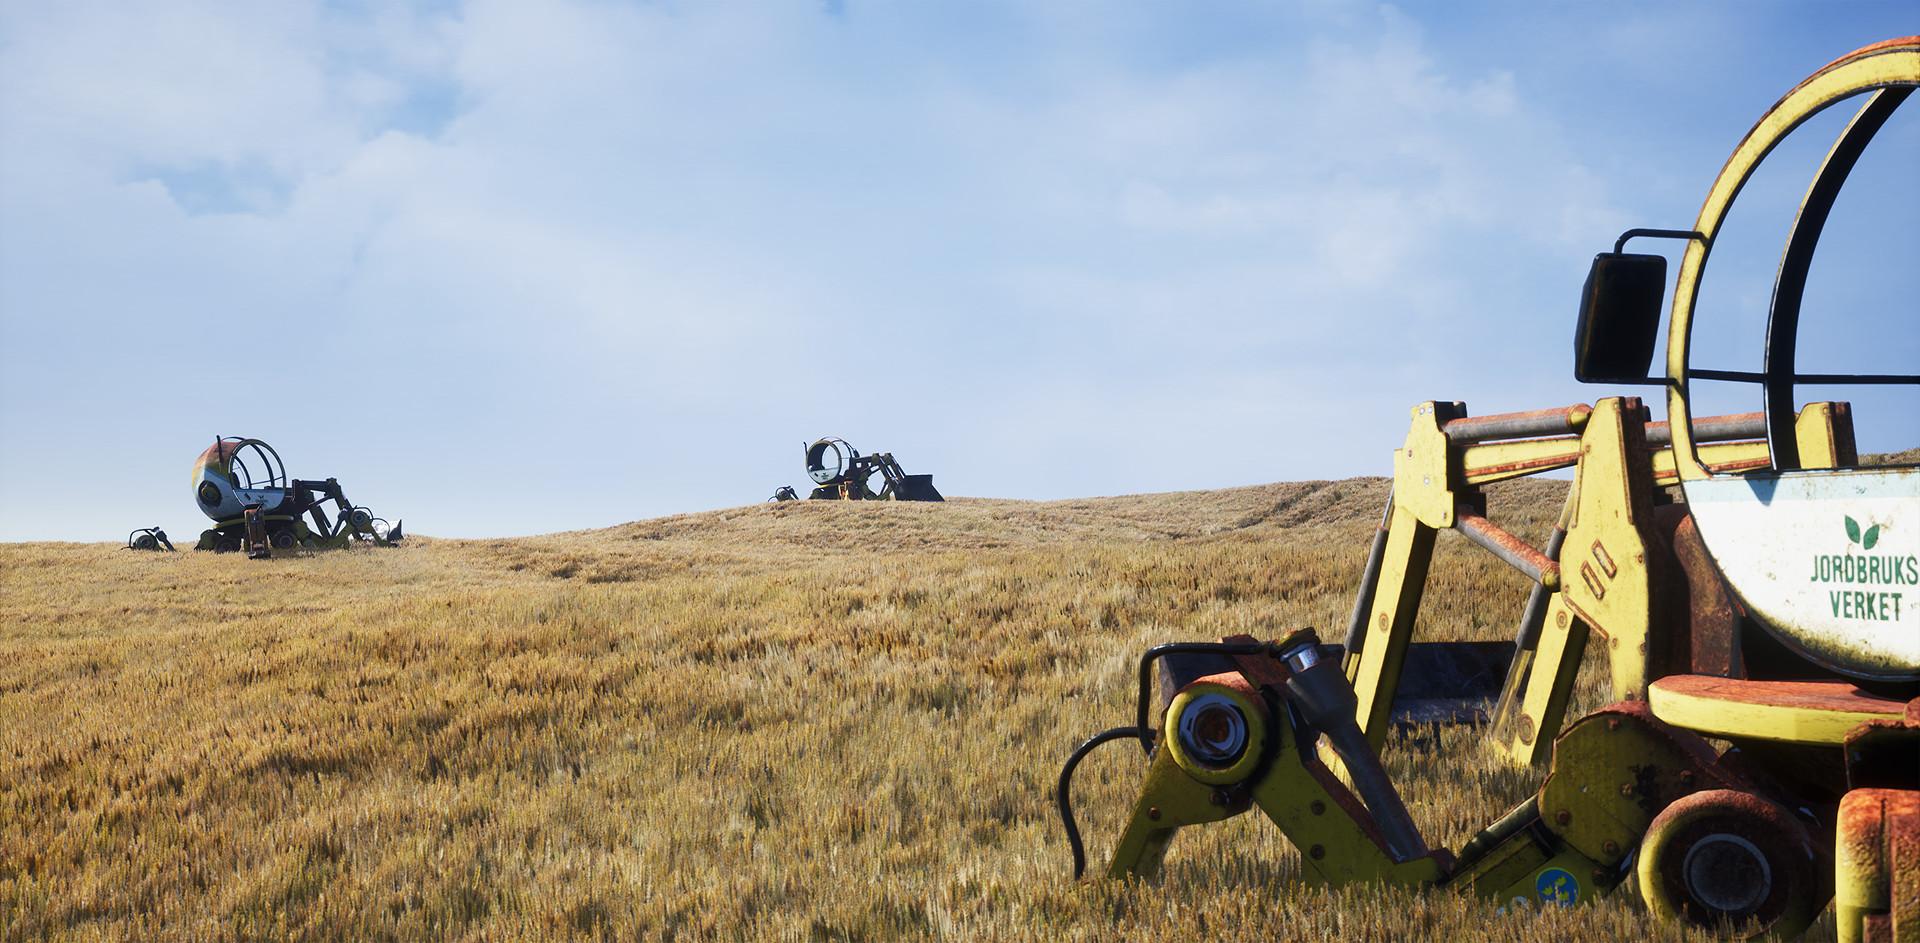 Wiktor ohman tractor alt shot